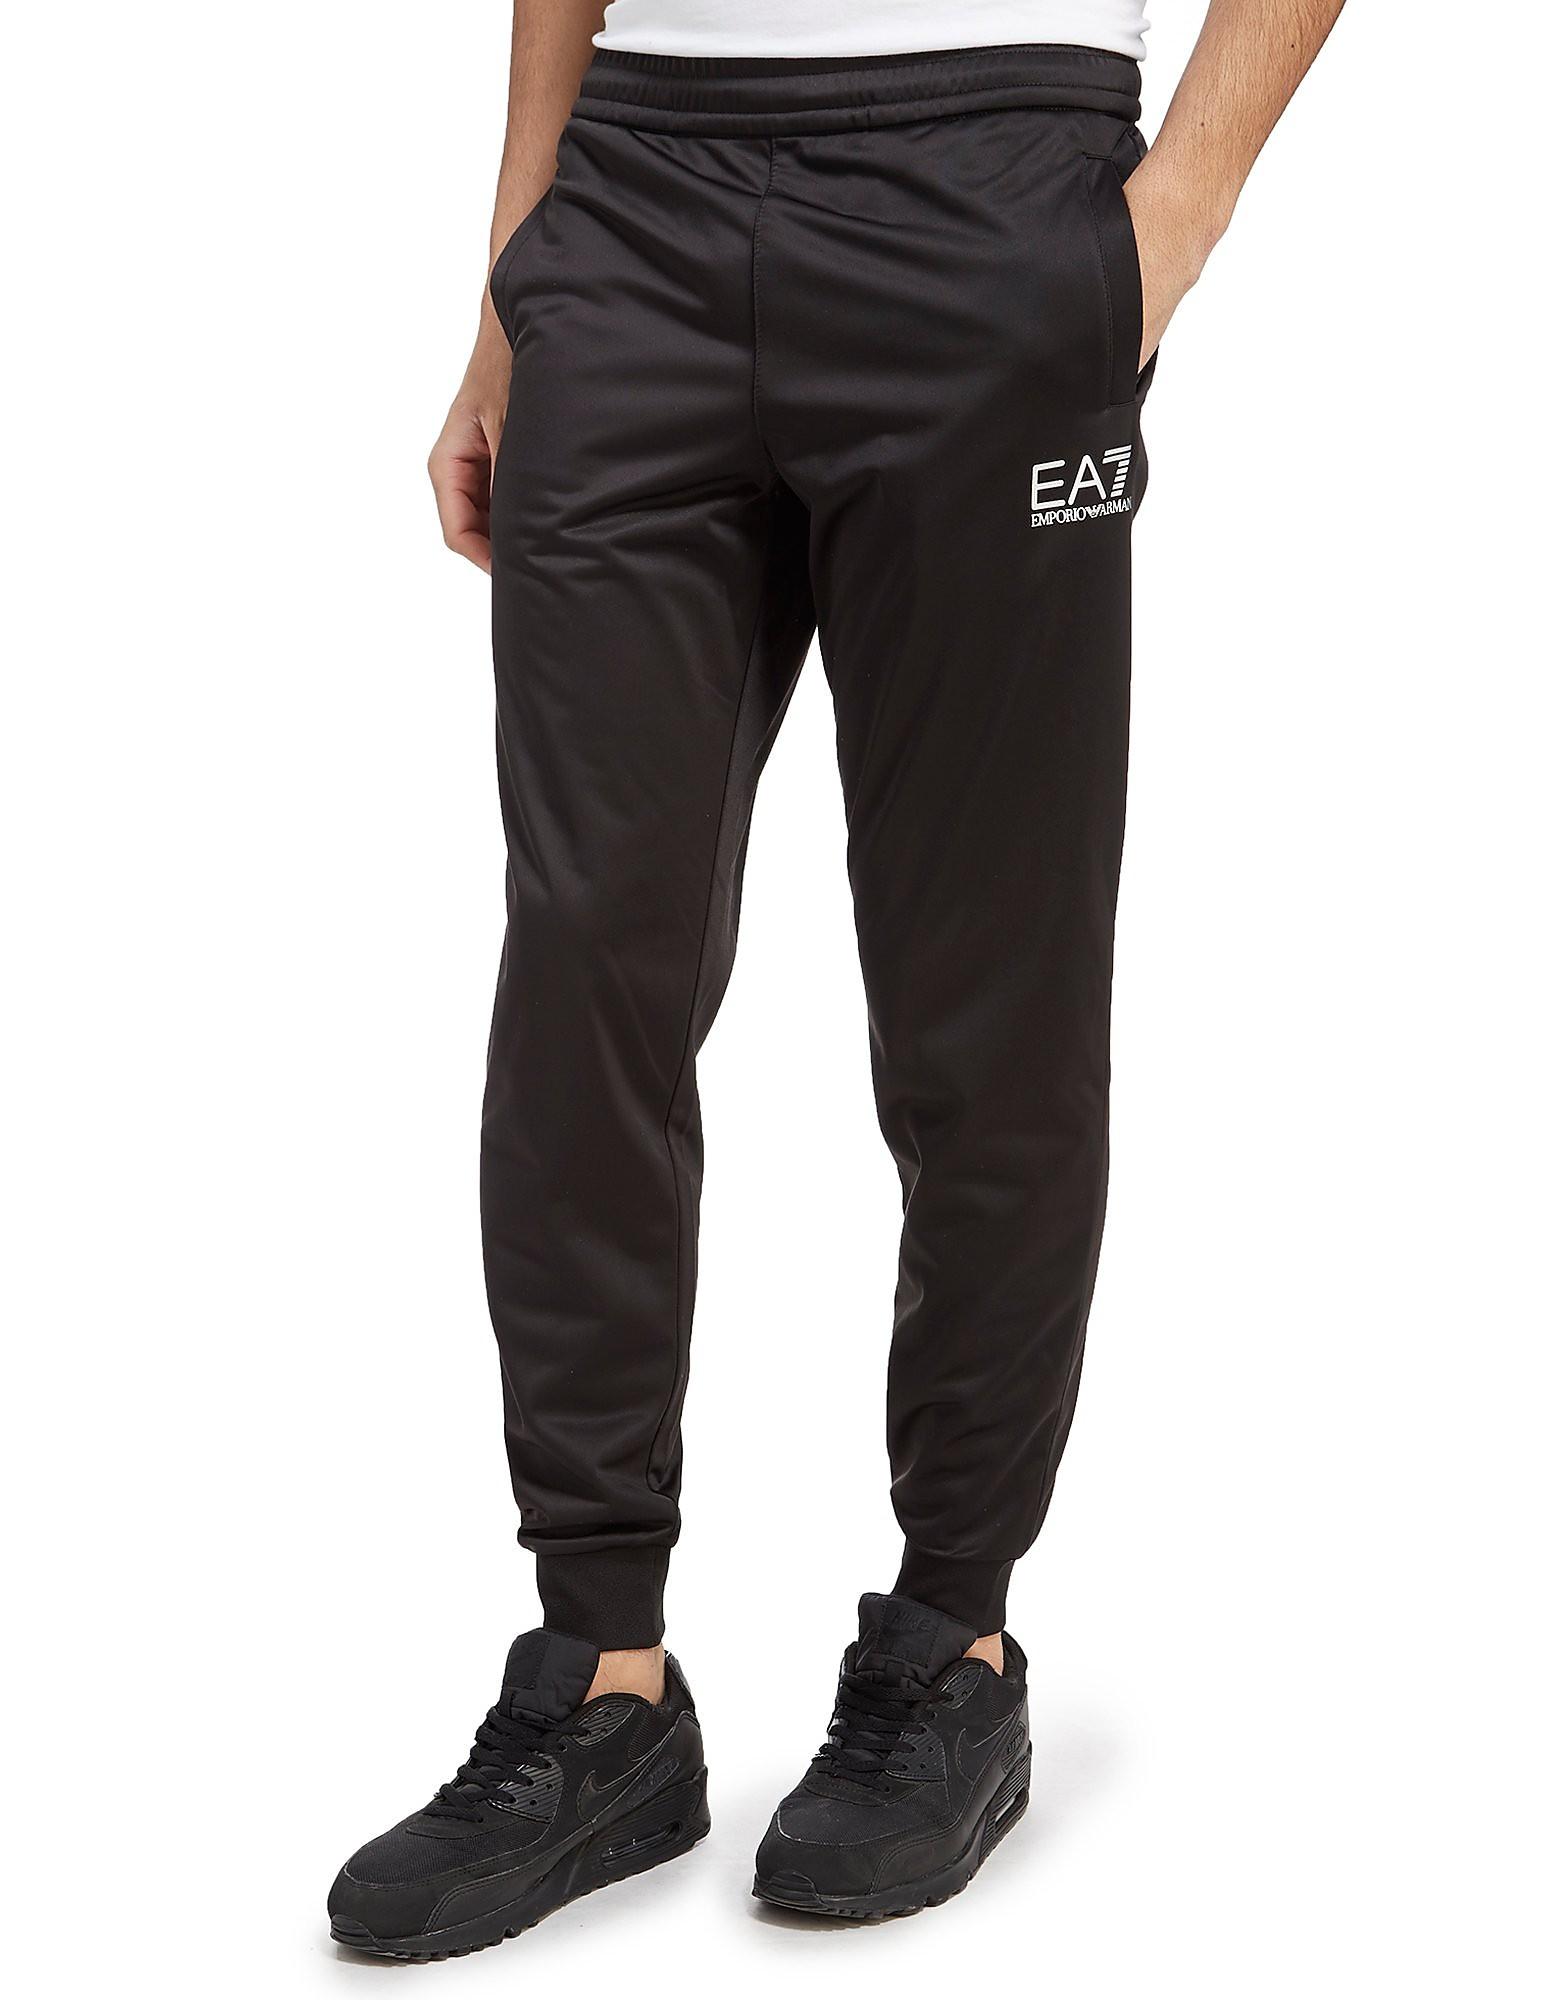 Emporio Armani EA7 Core Track Pants